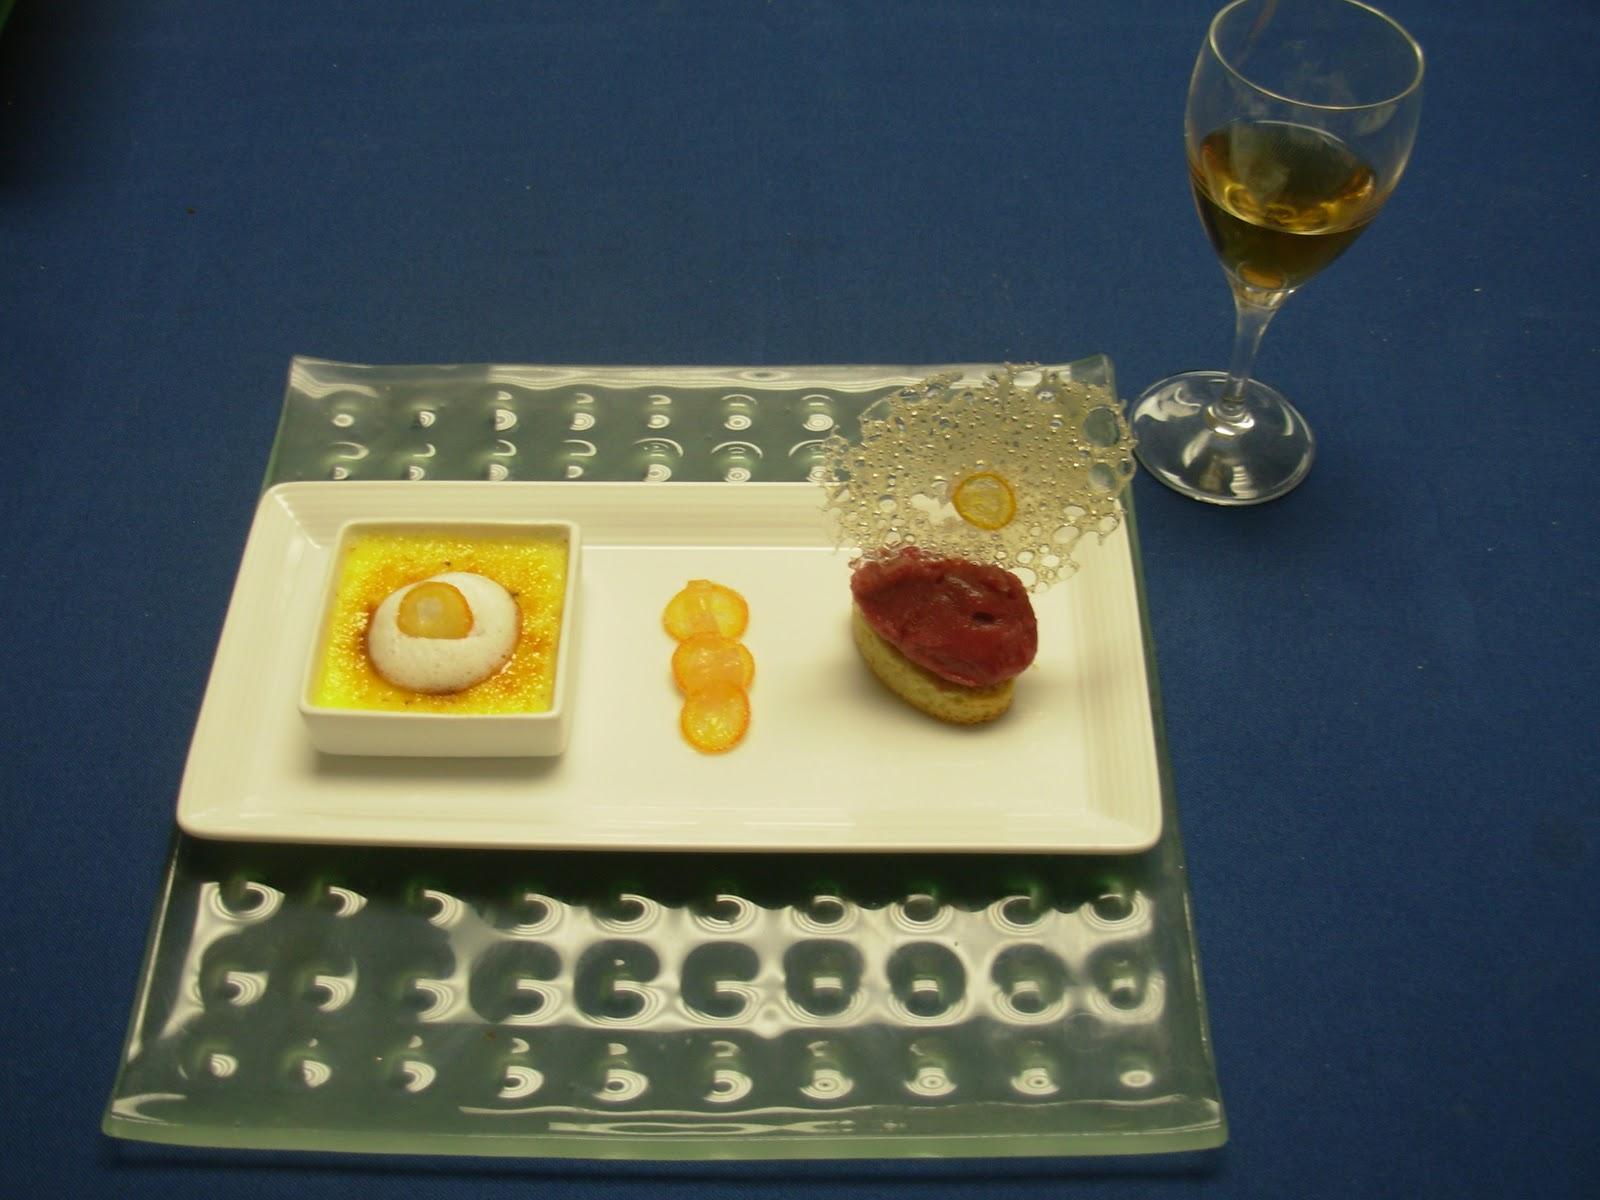 Beerenauslese Riesling white dessert wine pairing. Vanilla brulee with ...